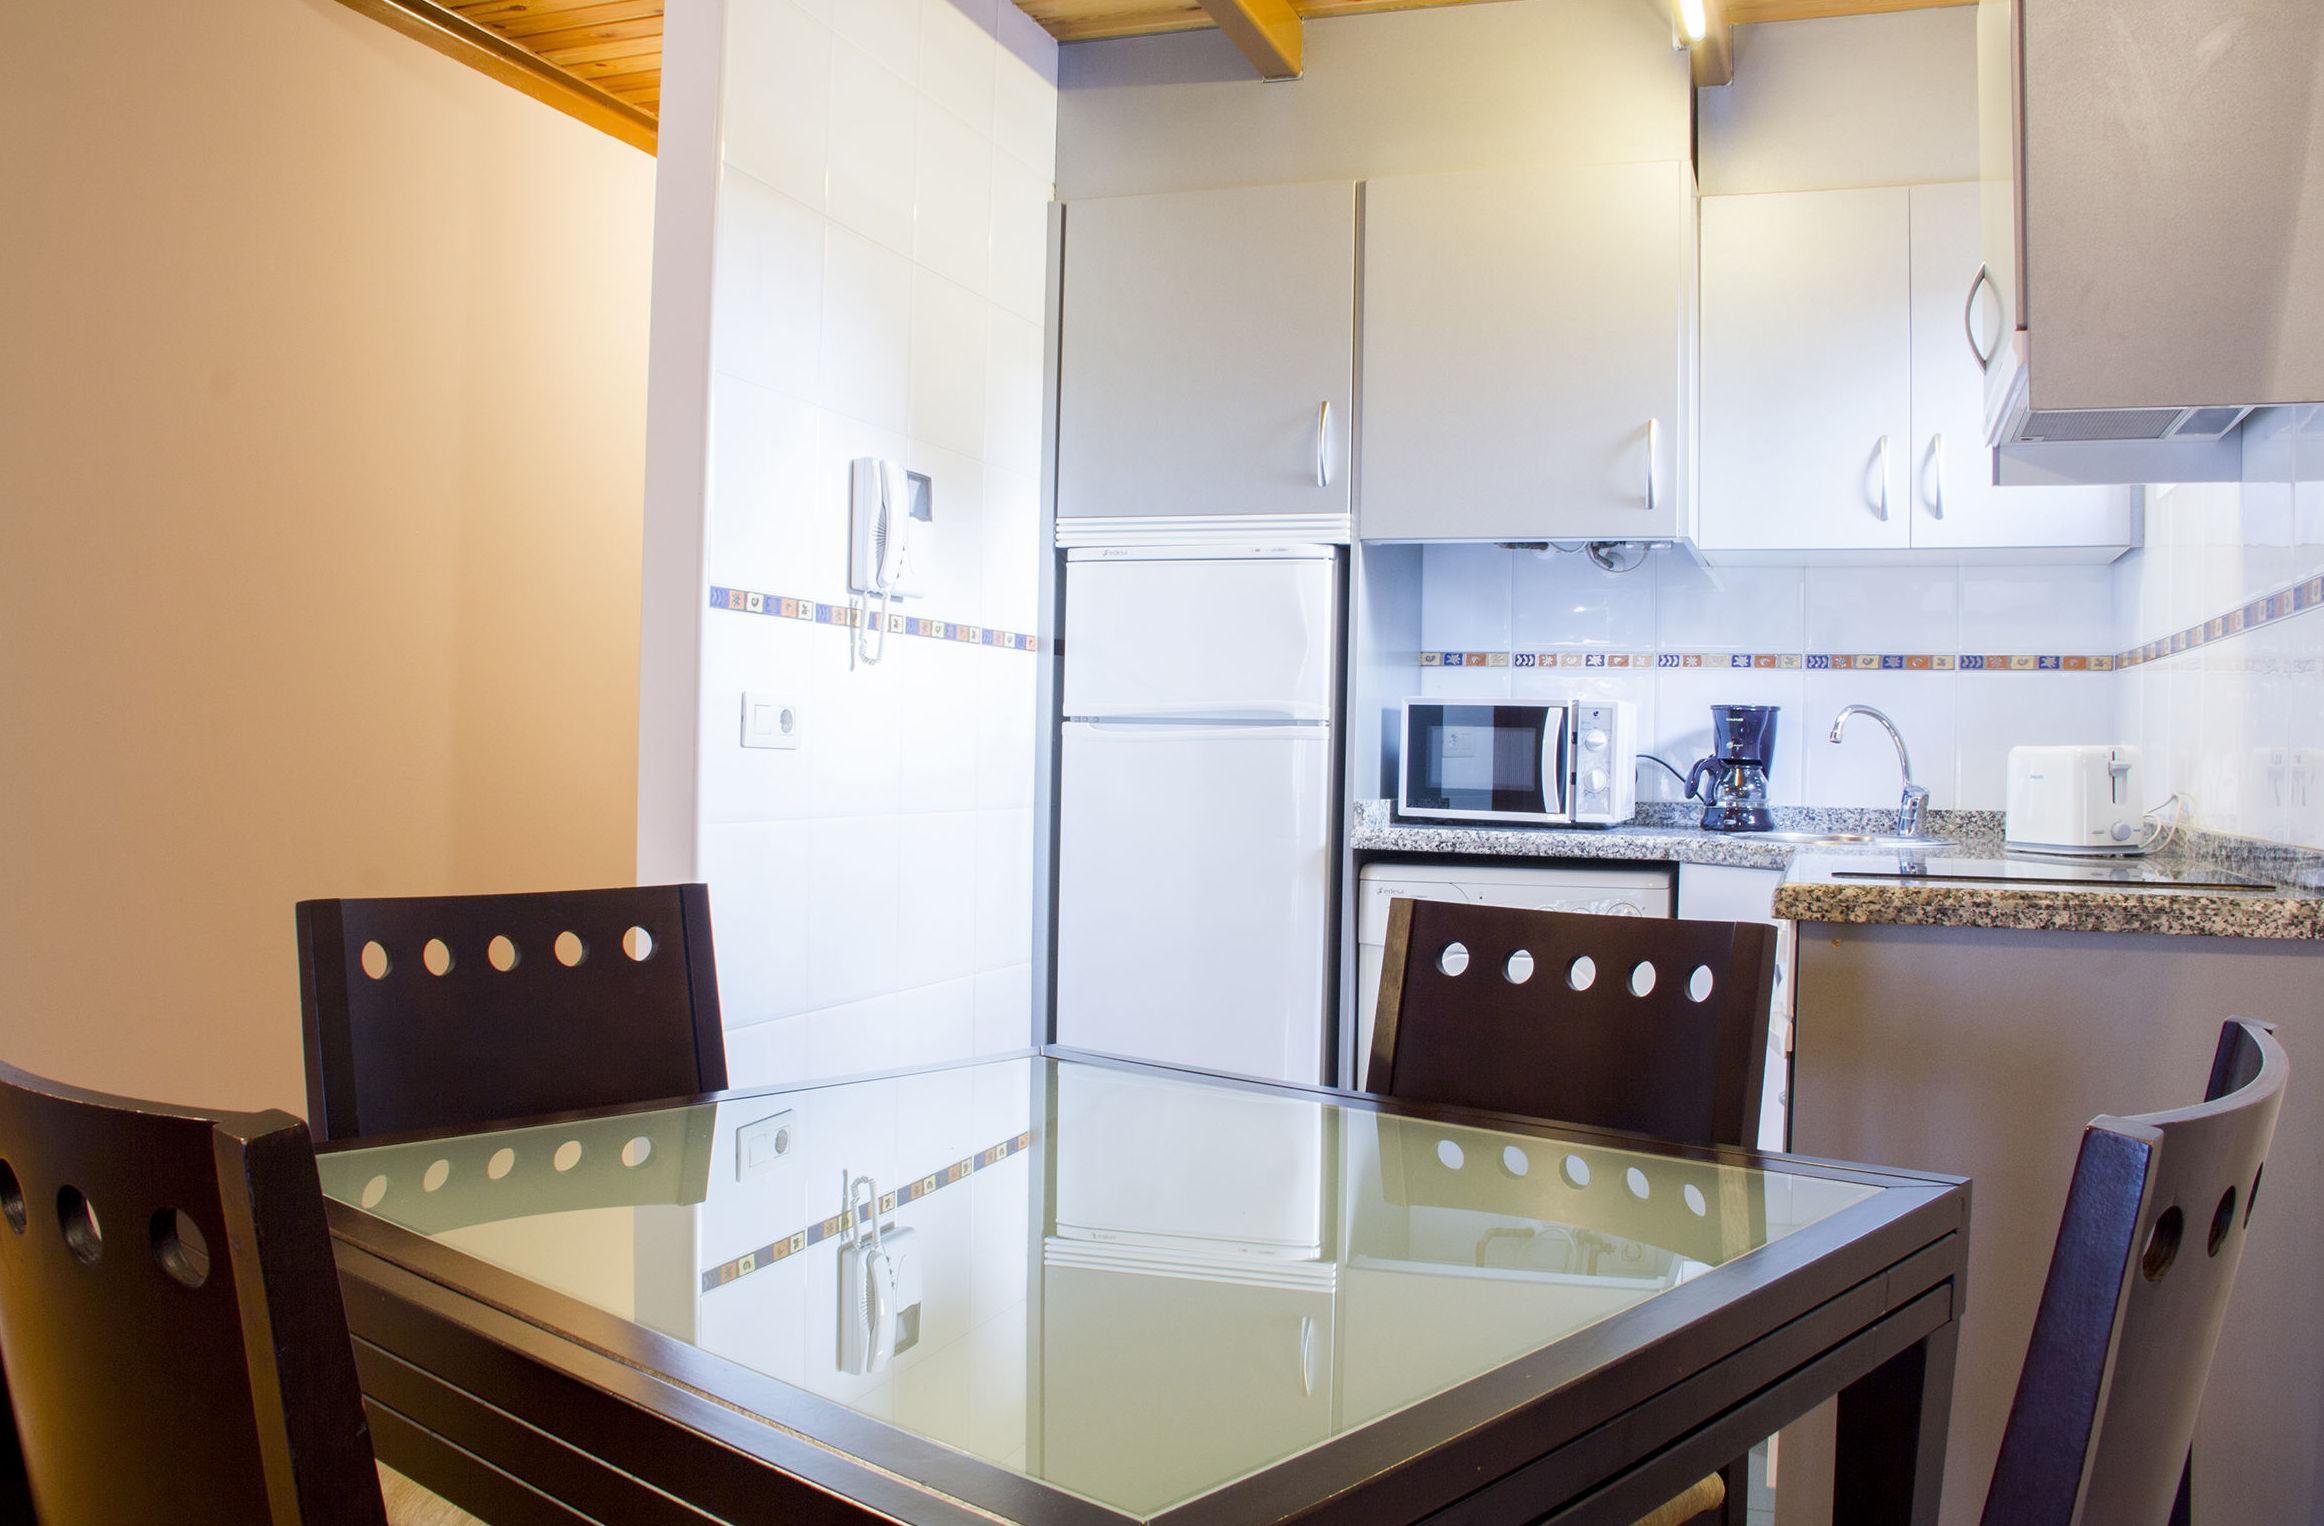 Cocina apartamento 2-4 pax.